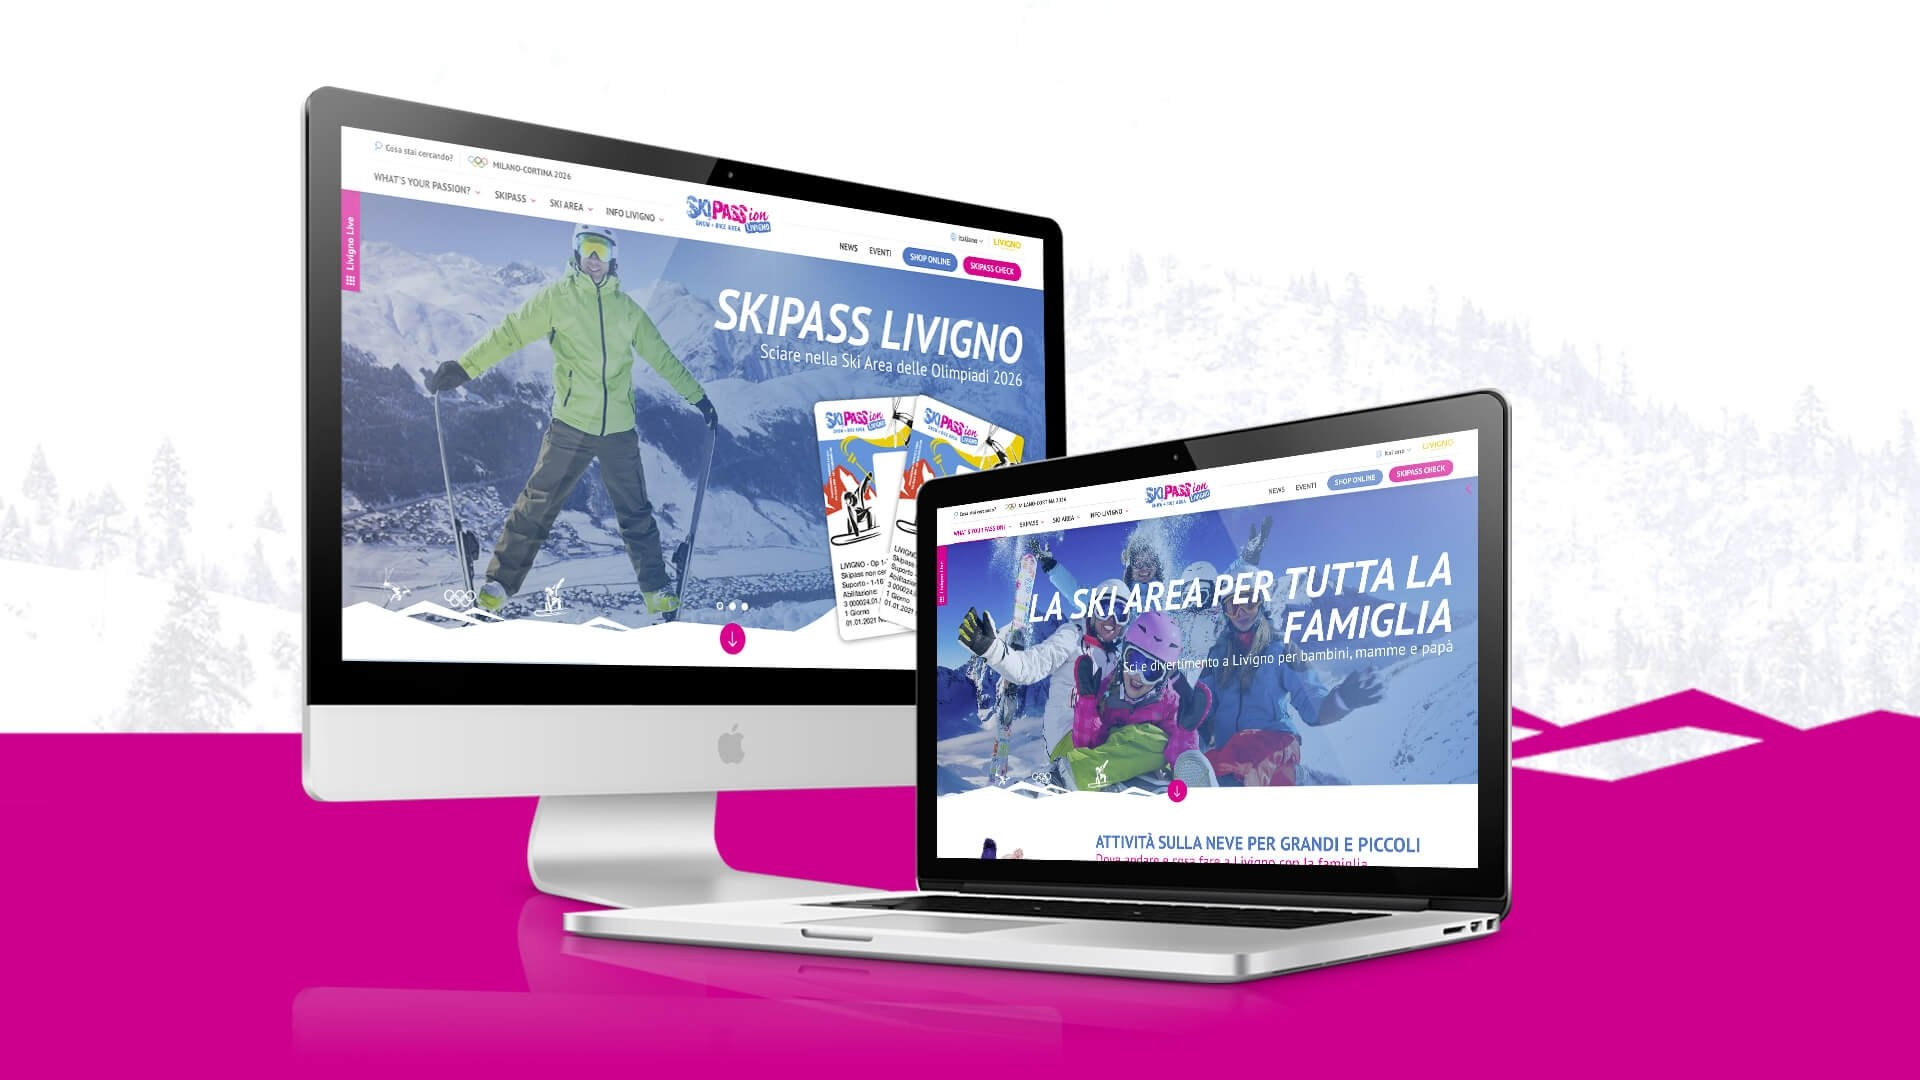 Portale web di Skipass Livigno sviluppato da Webtek